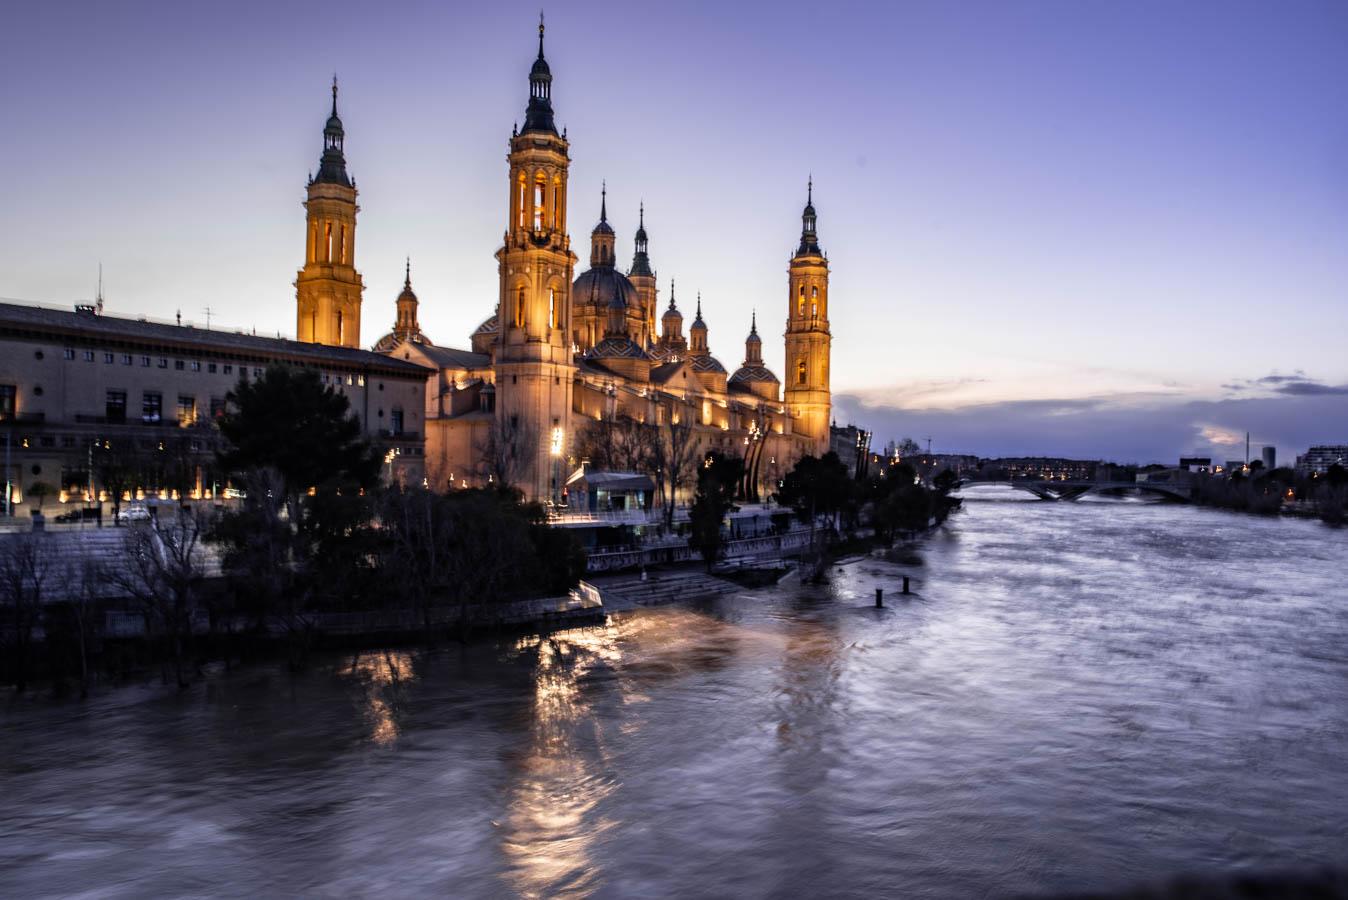 The Basilica of Zaragoza is a top attraction in Zaragoza